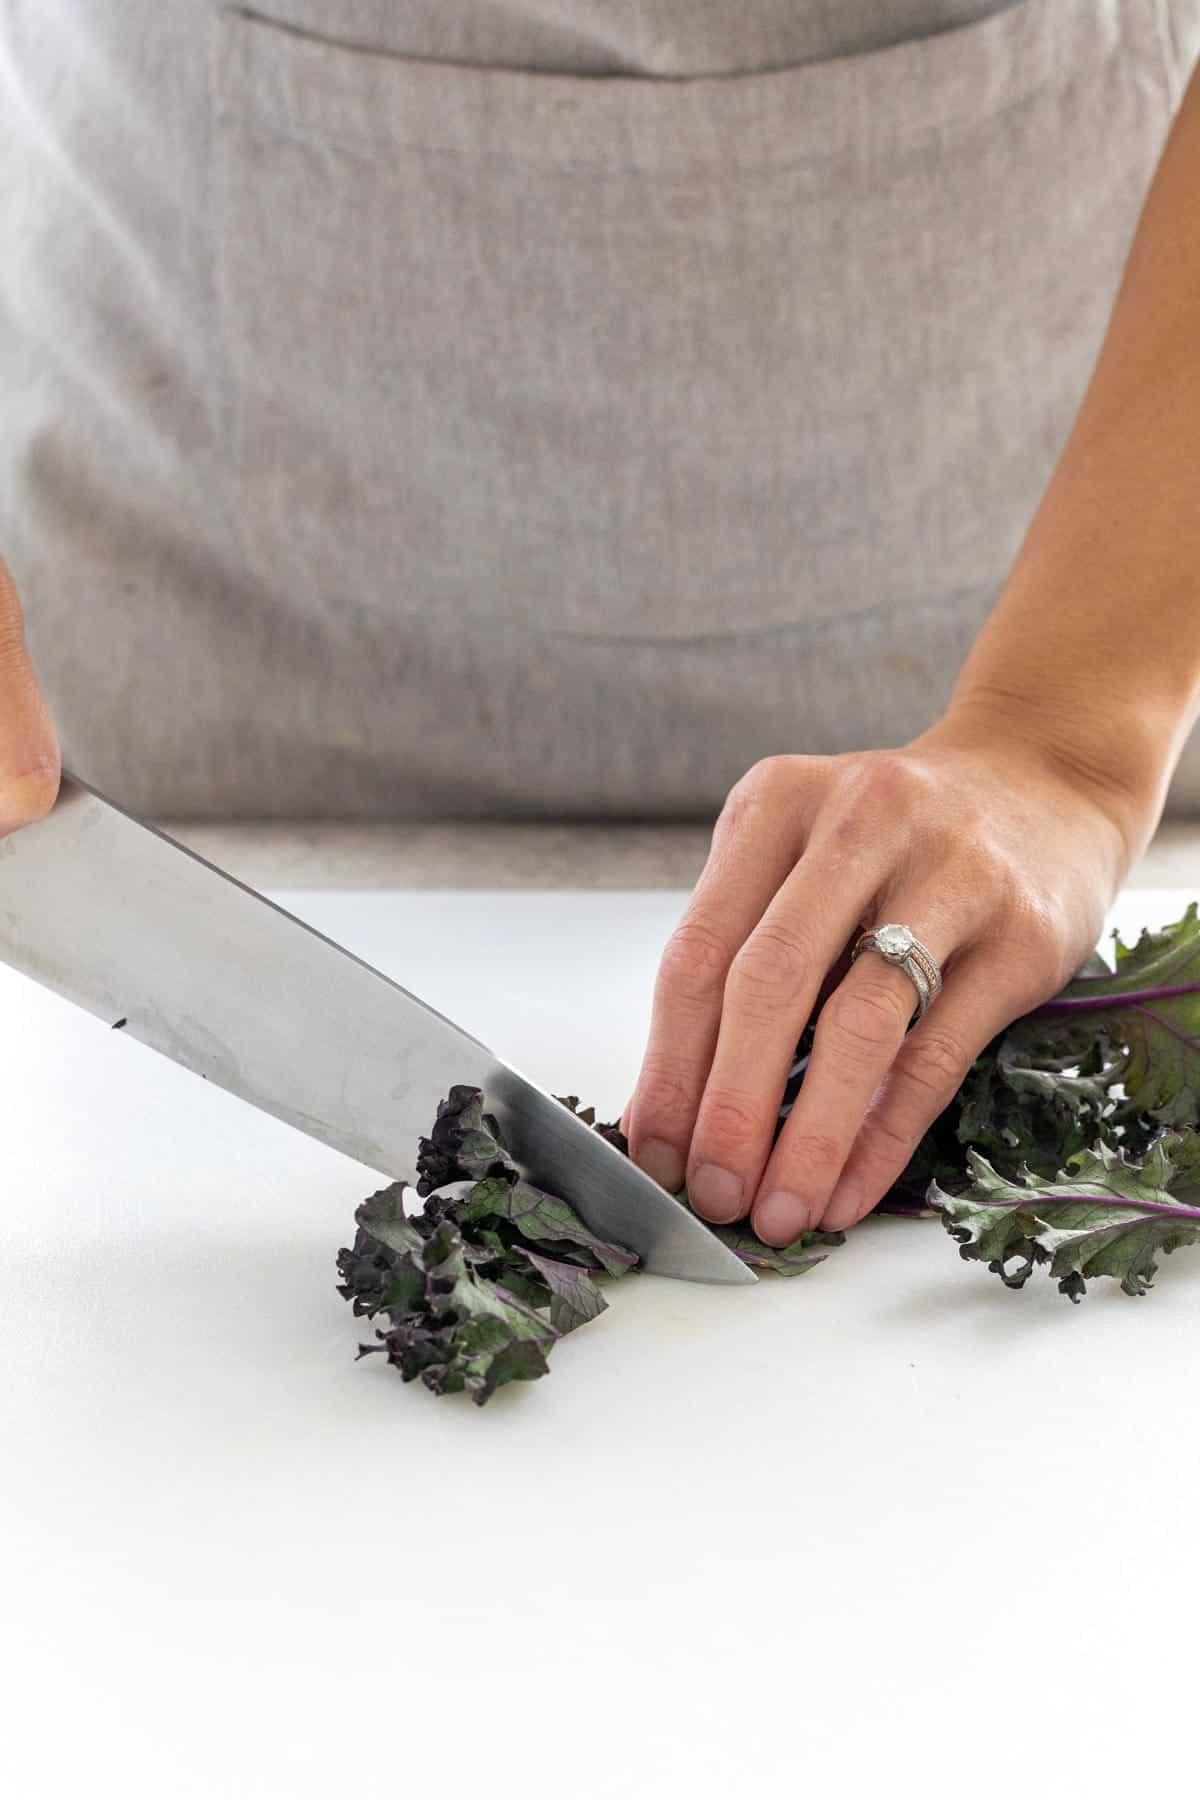 cut the kale into smaller pieces